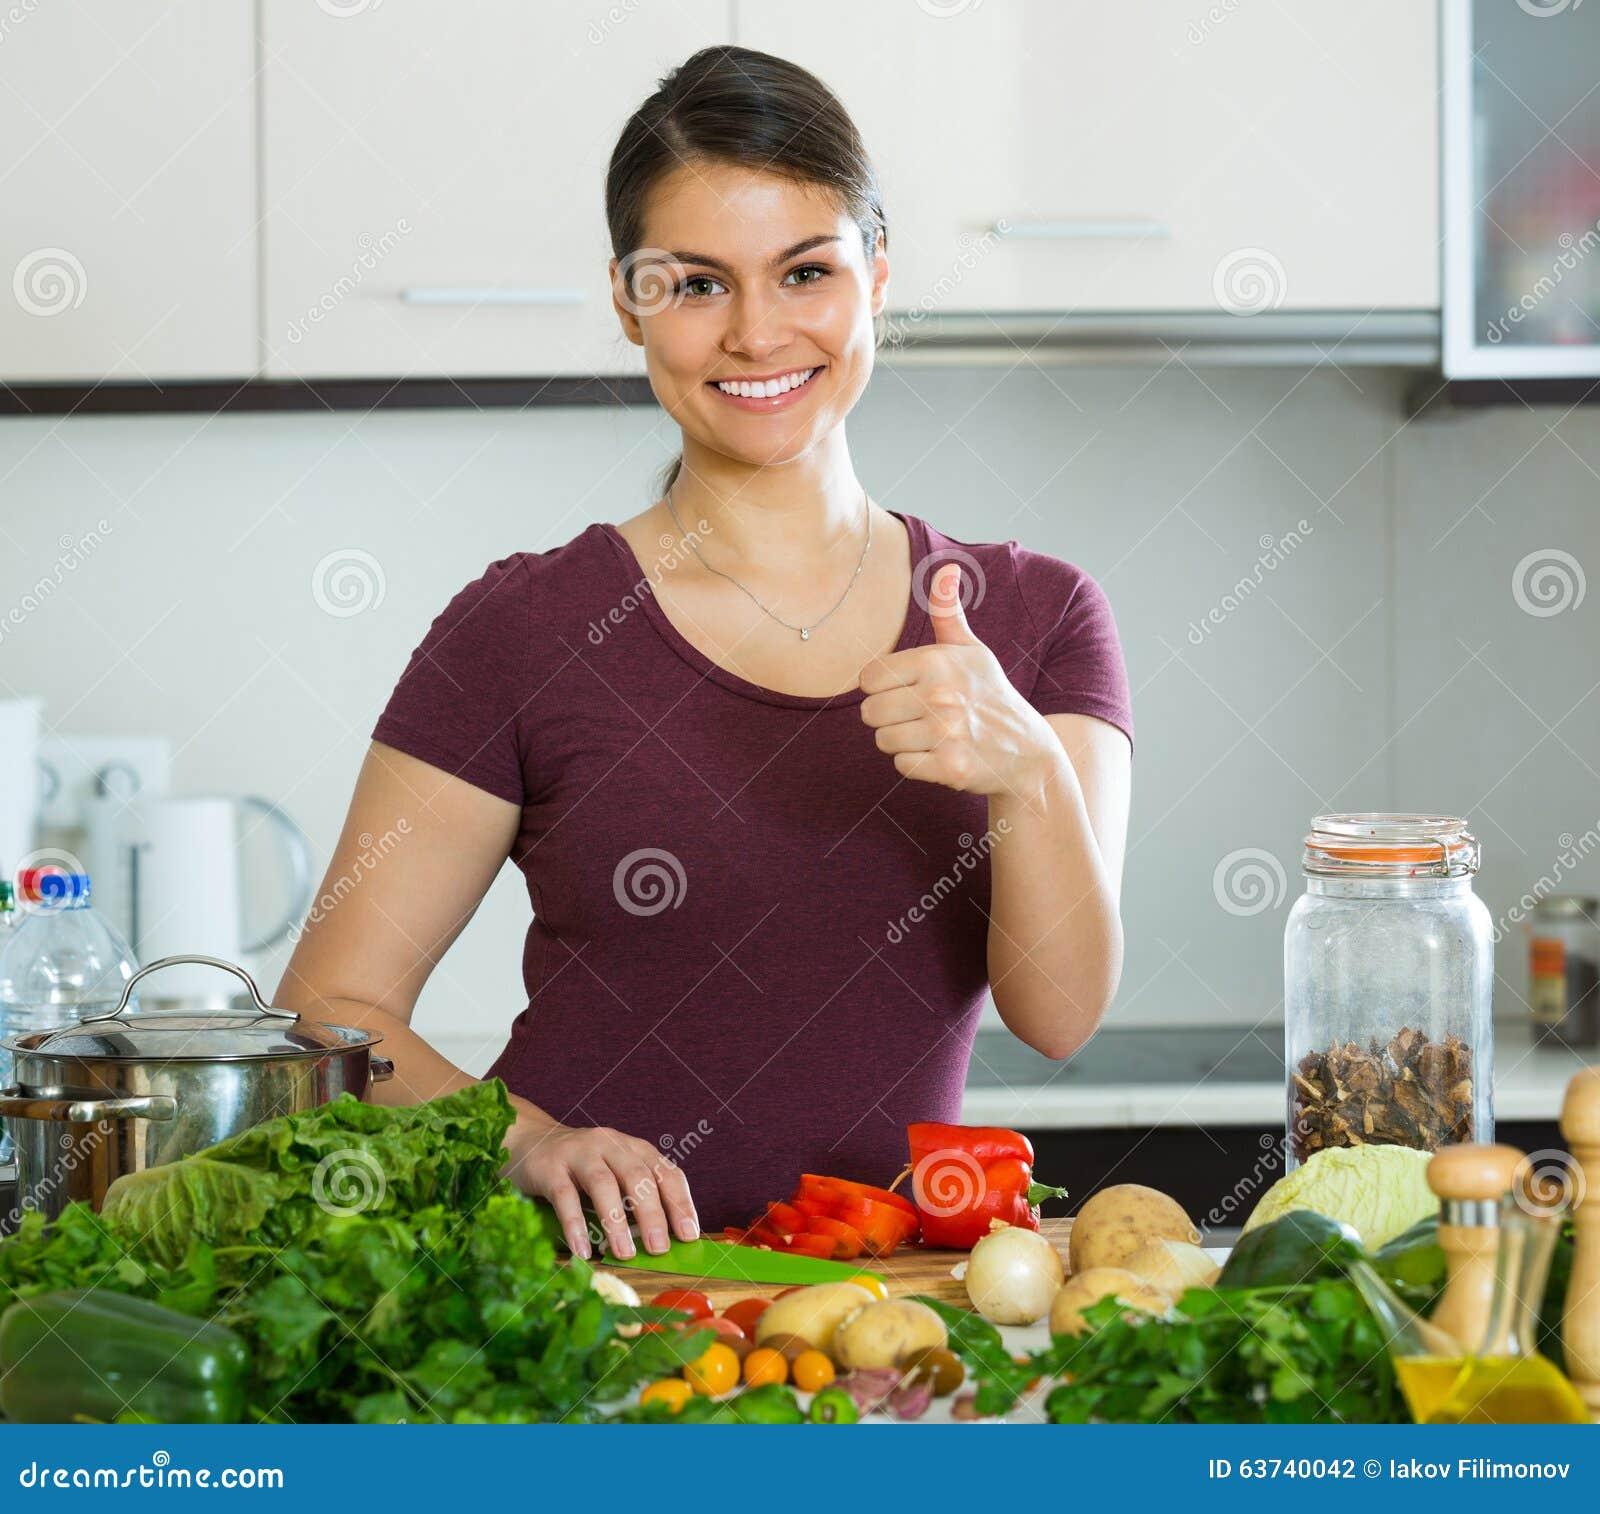 image J20yo esposa joven estilo de la cocina